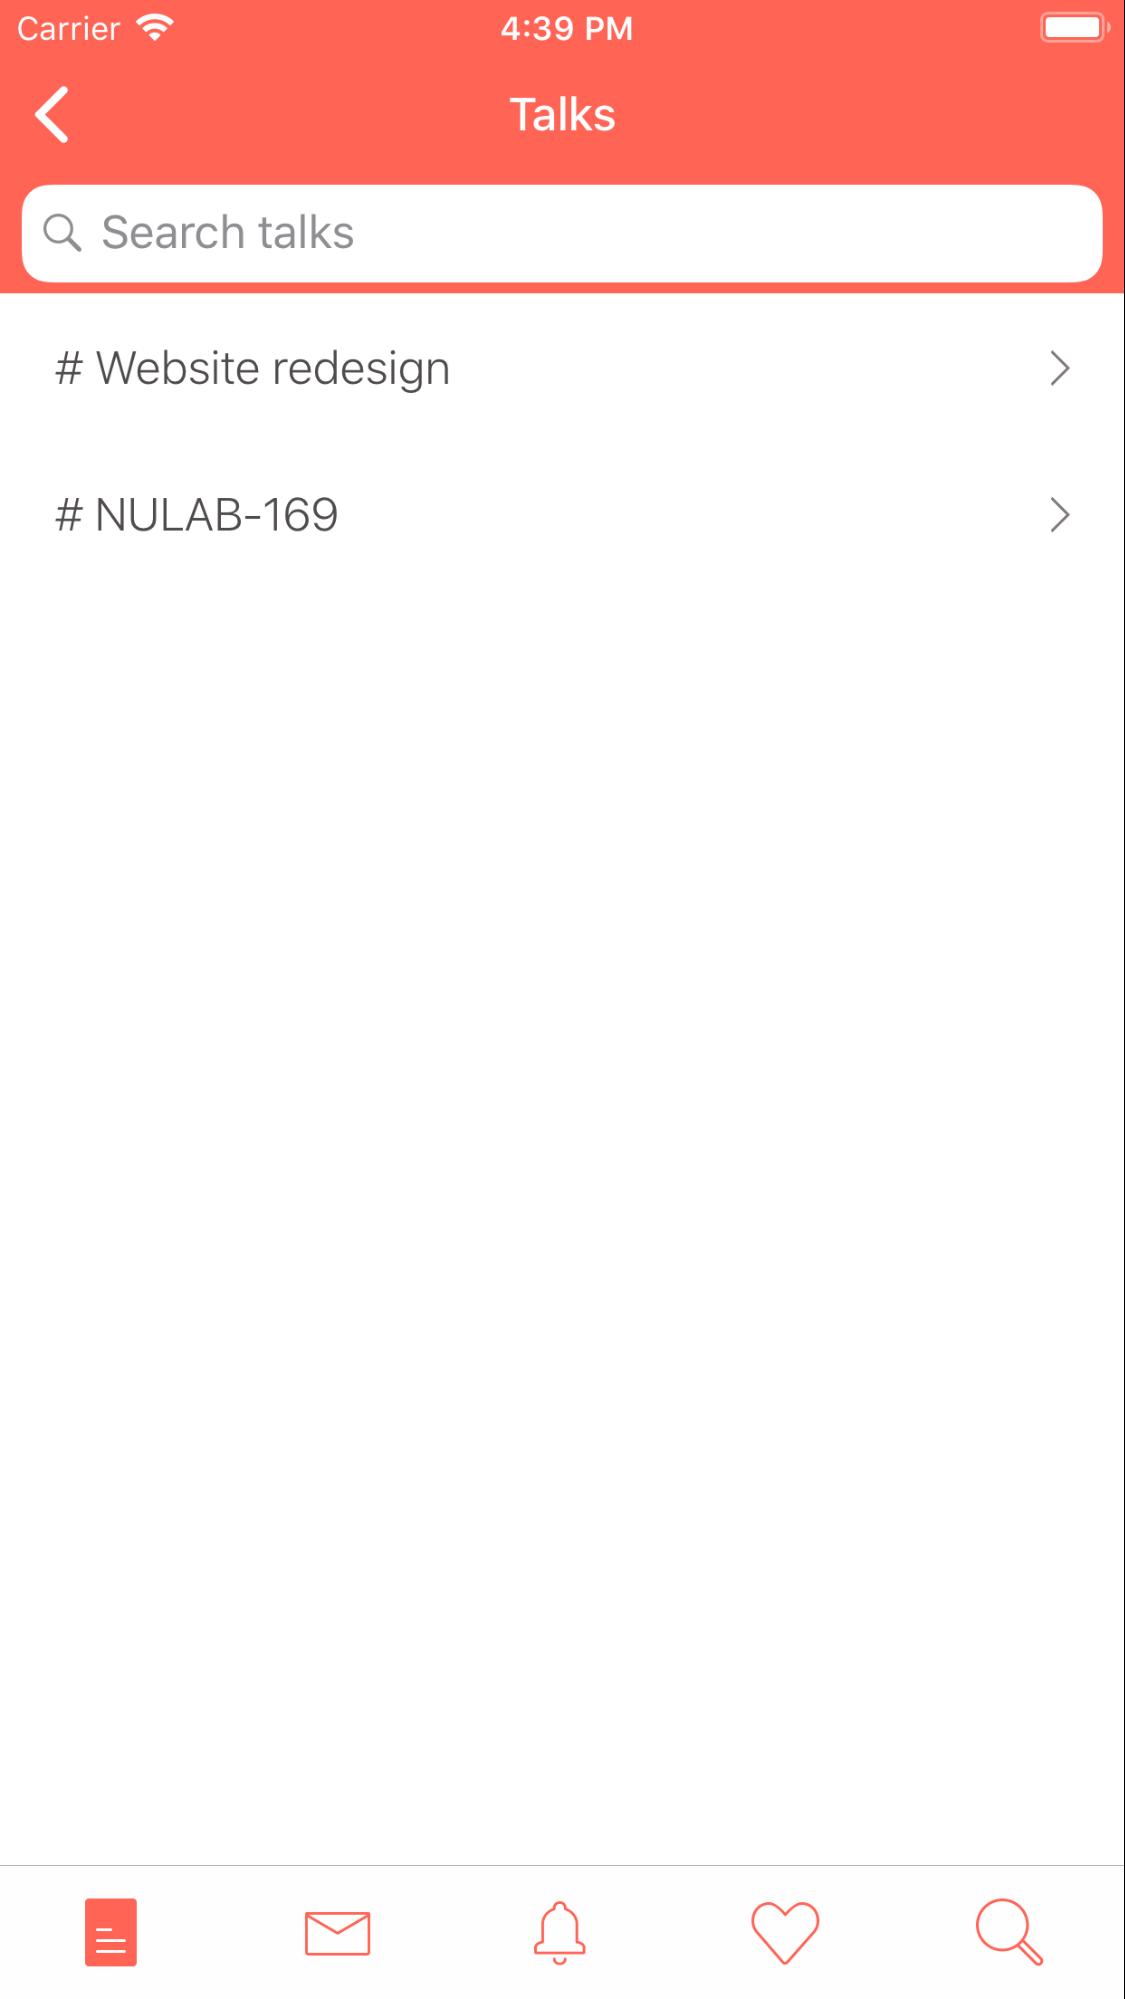 Search talks on Typetalk for iOS